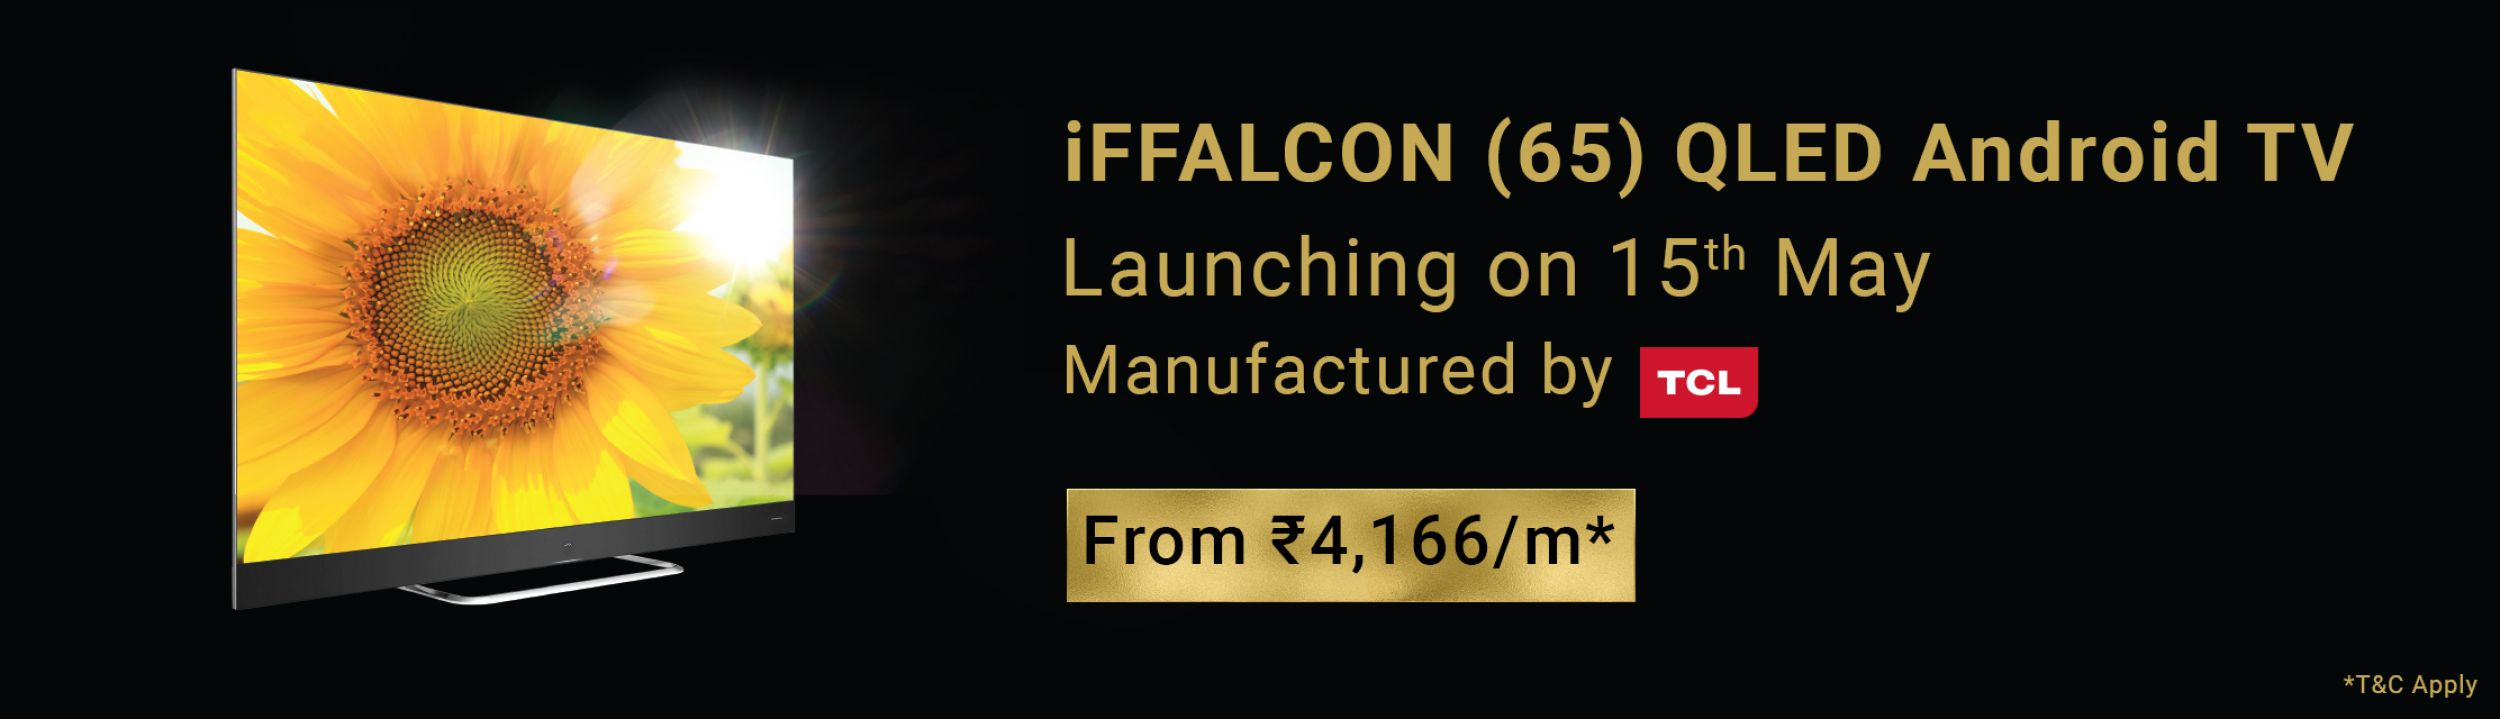 TV-iFFALCON-Launch-65